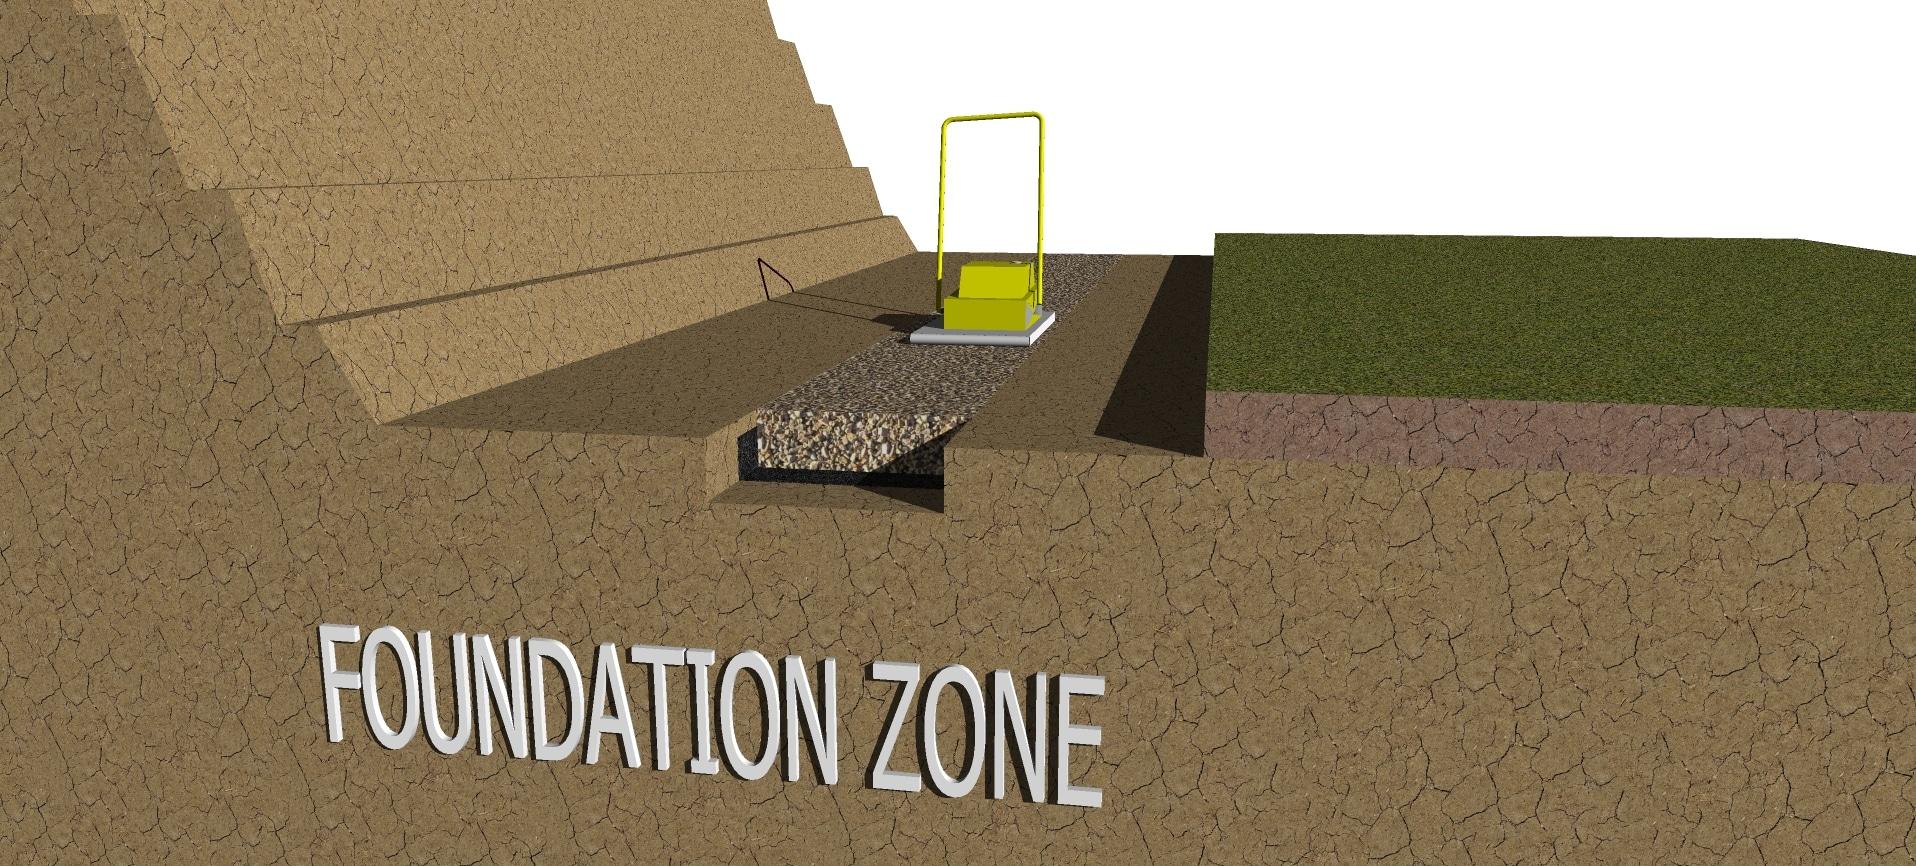 base gravel for geogrid retaining walls